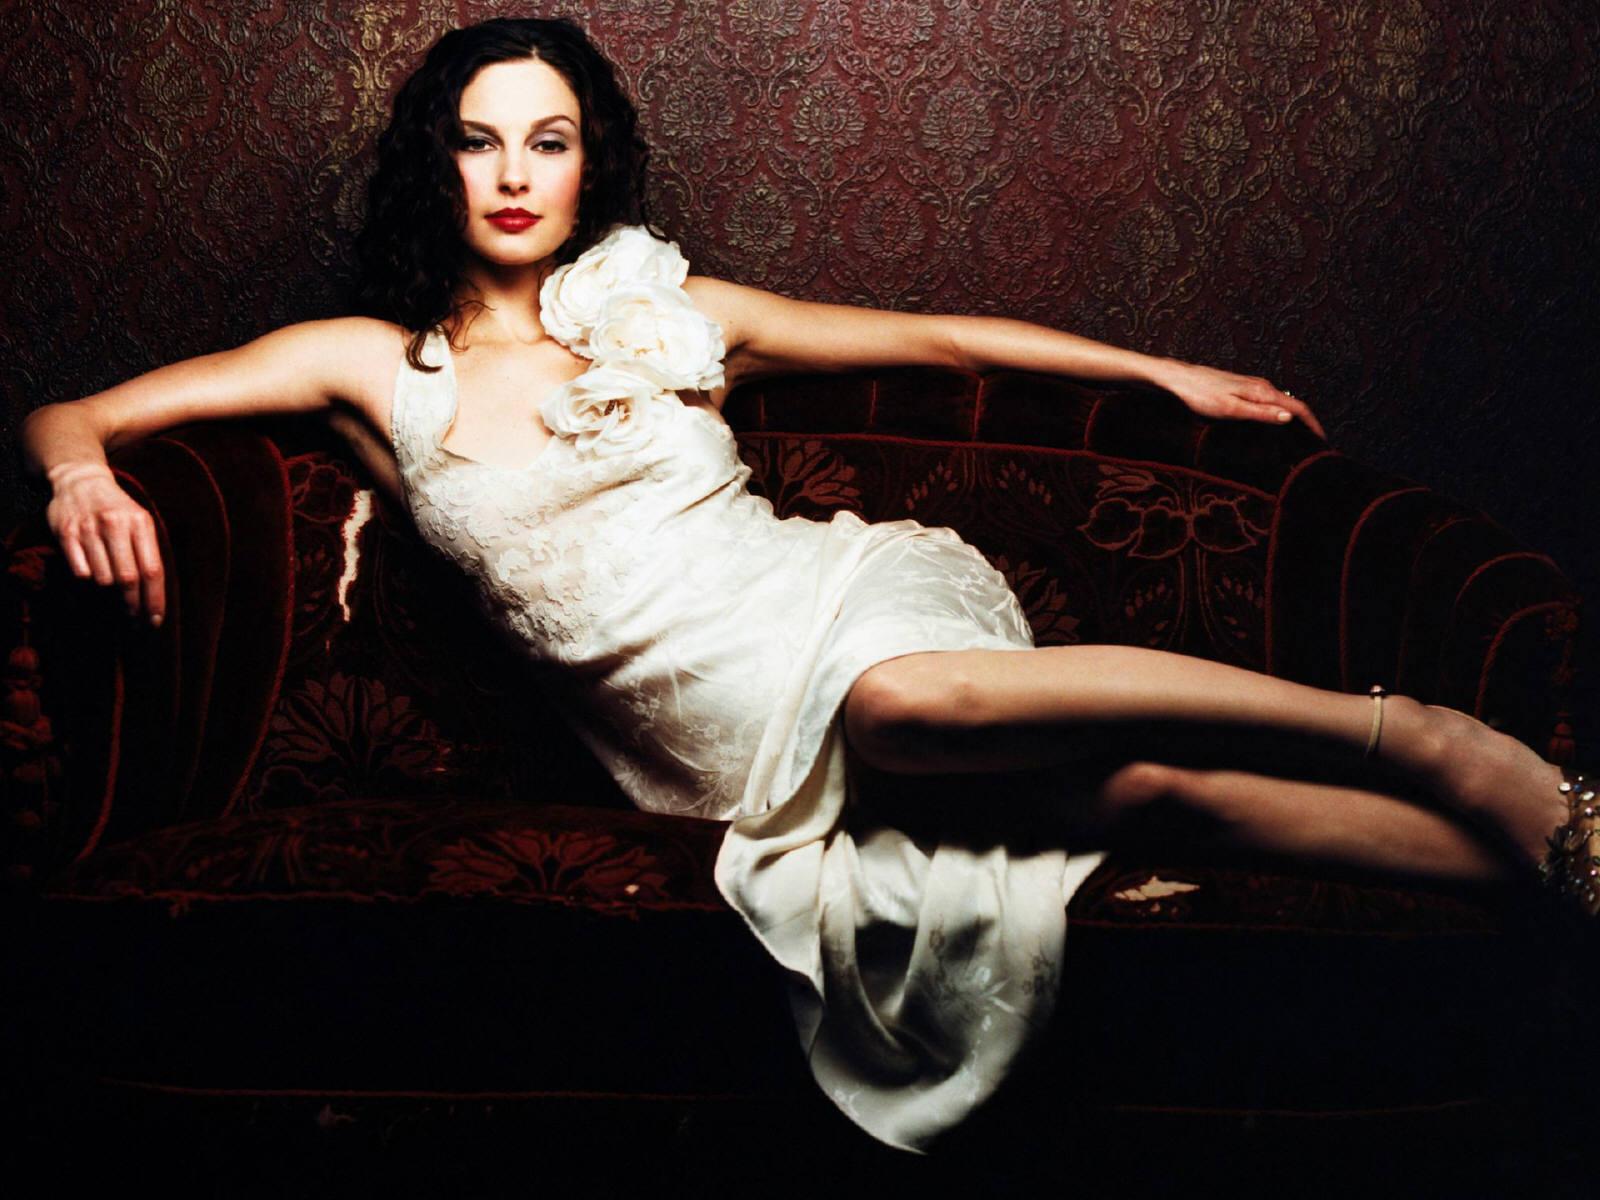 Ashley Judd Cunt rip cute ashley judd--she reads 6 minute mental illness